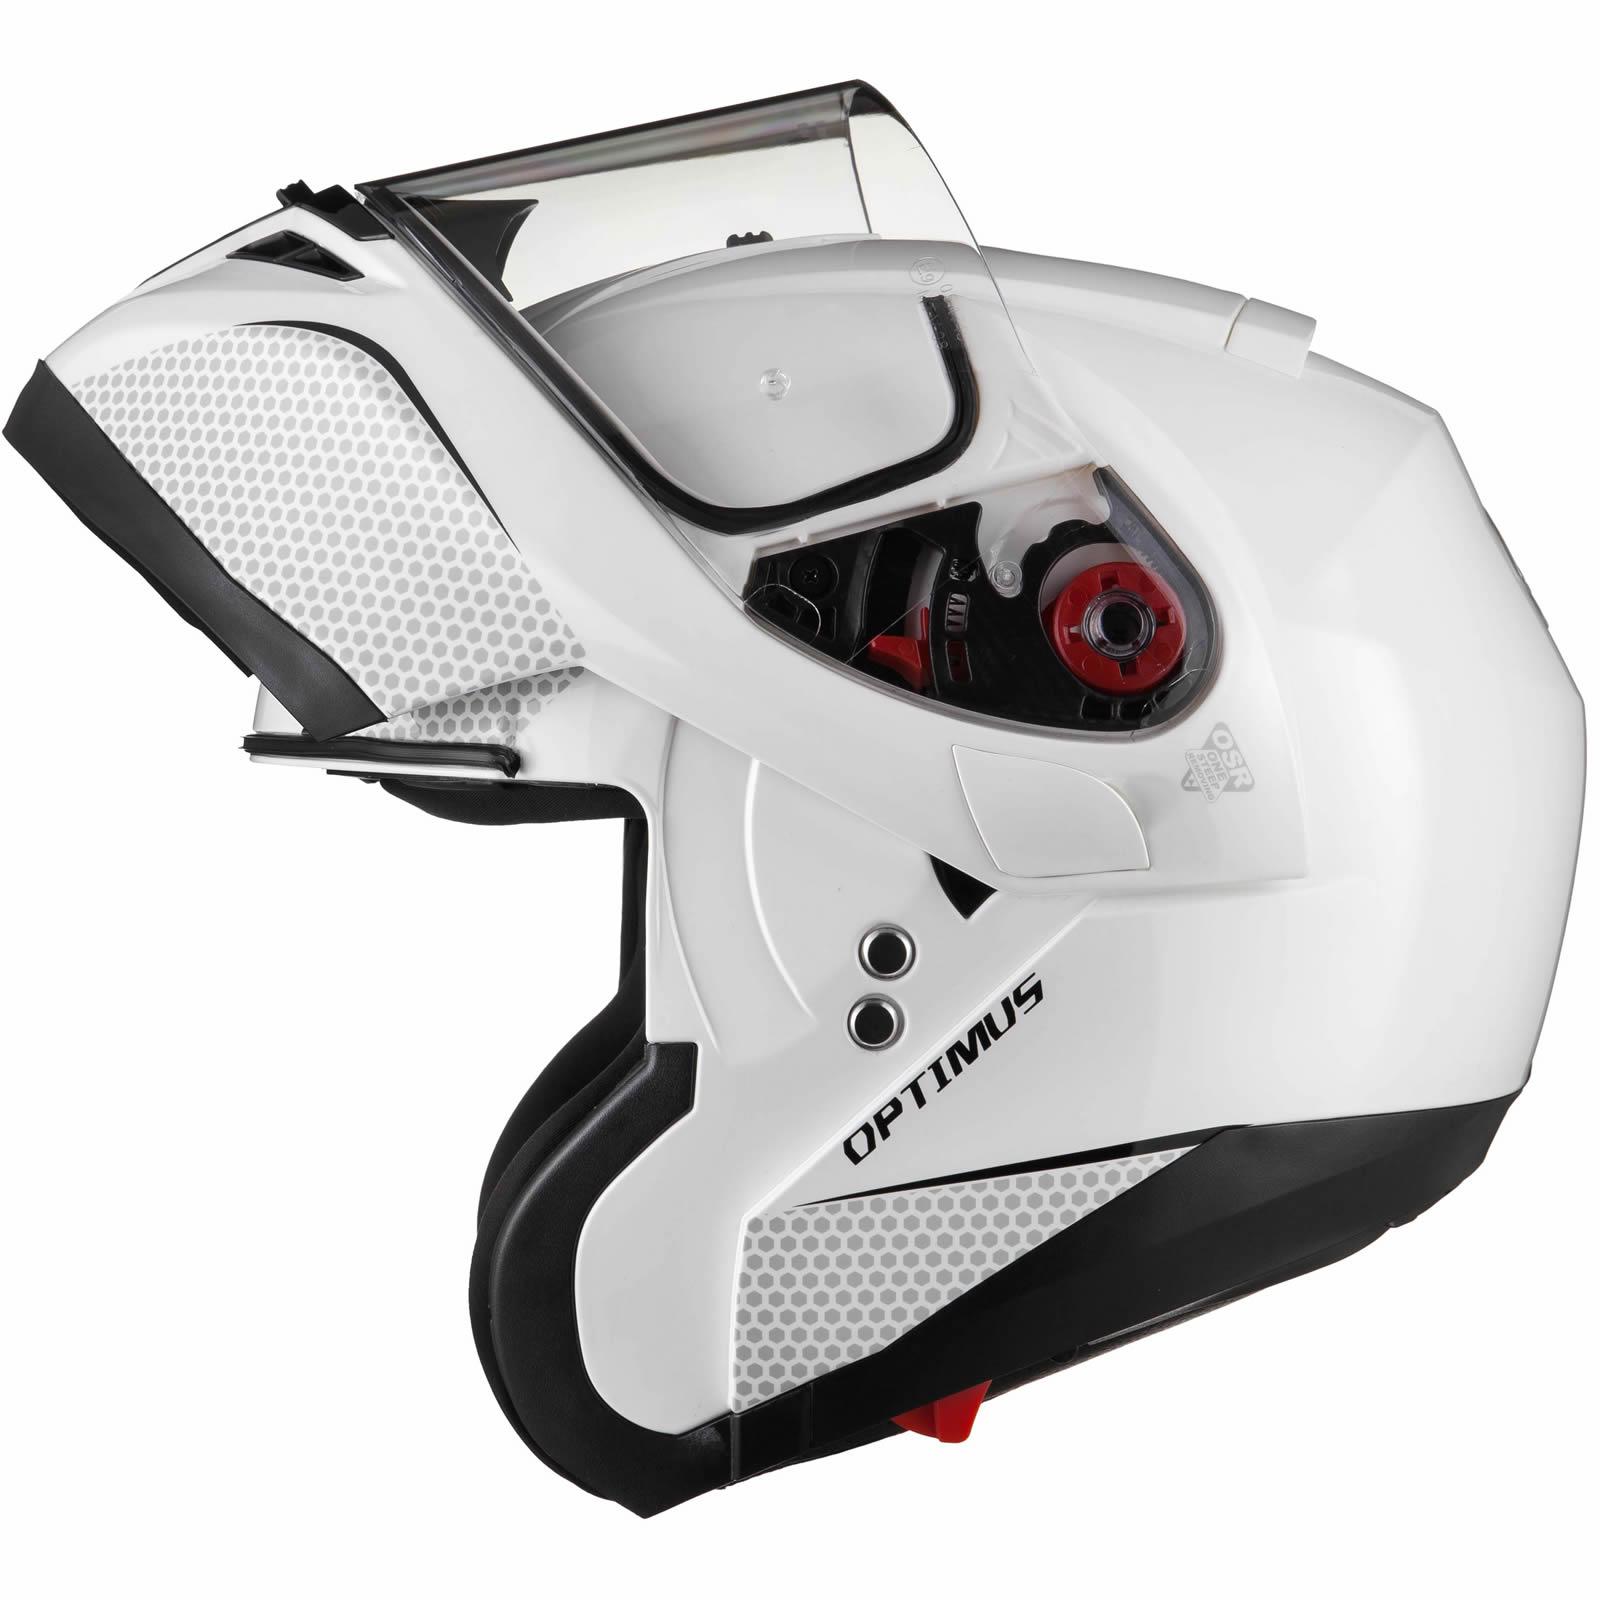 Black-Optimus-SV-Max-Vision-Flip-Up-Front-Motorcycle-Helmet-Pinlock-Ready-Visor thumbnail 27